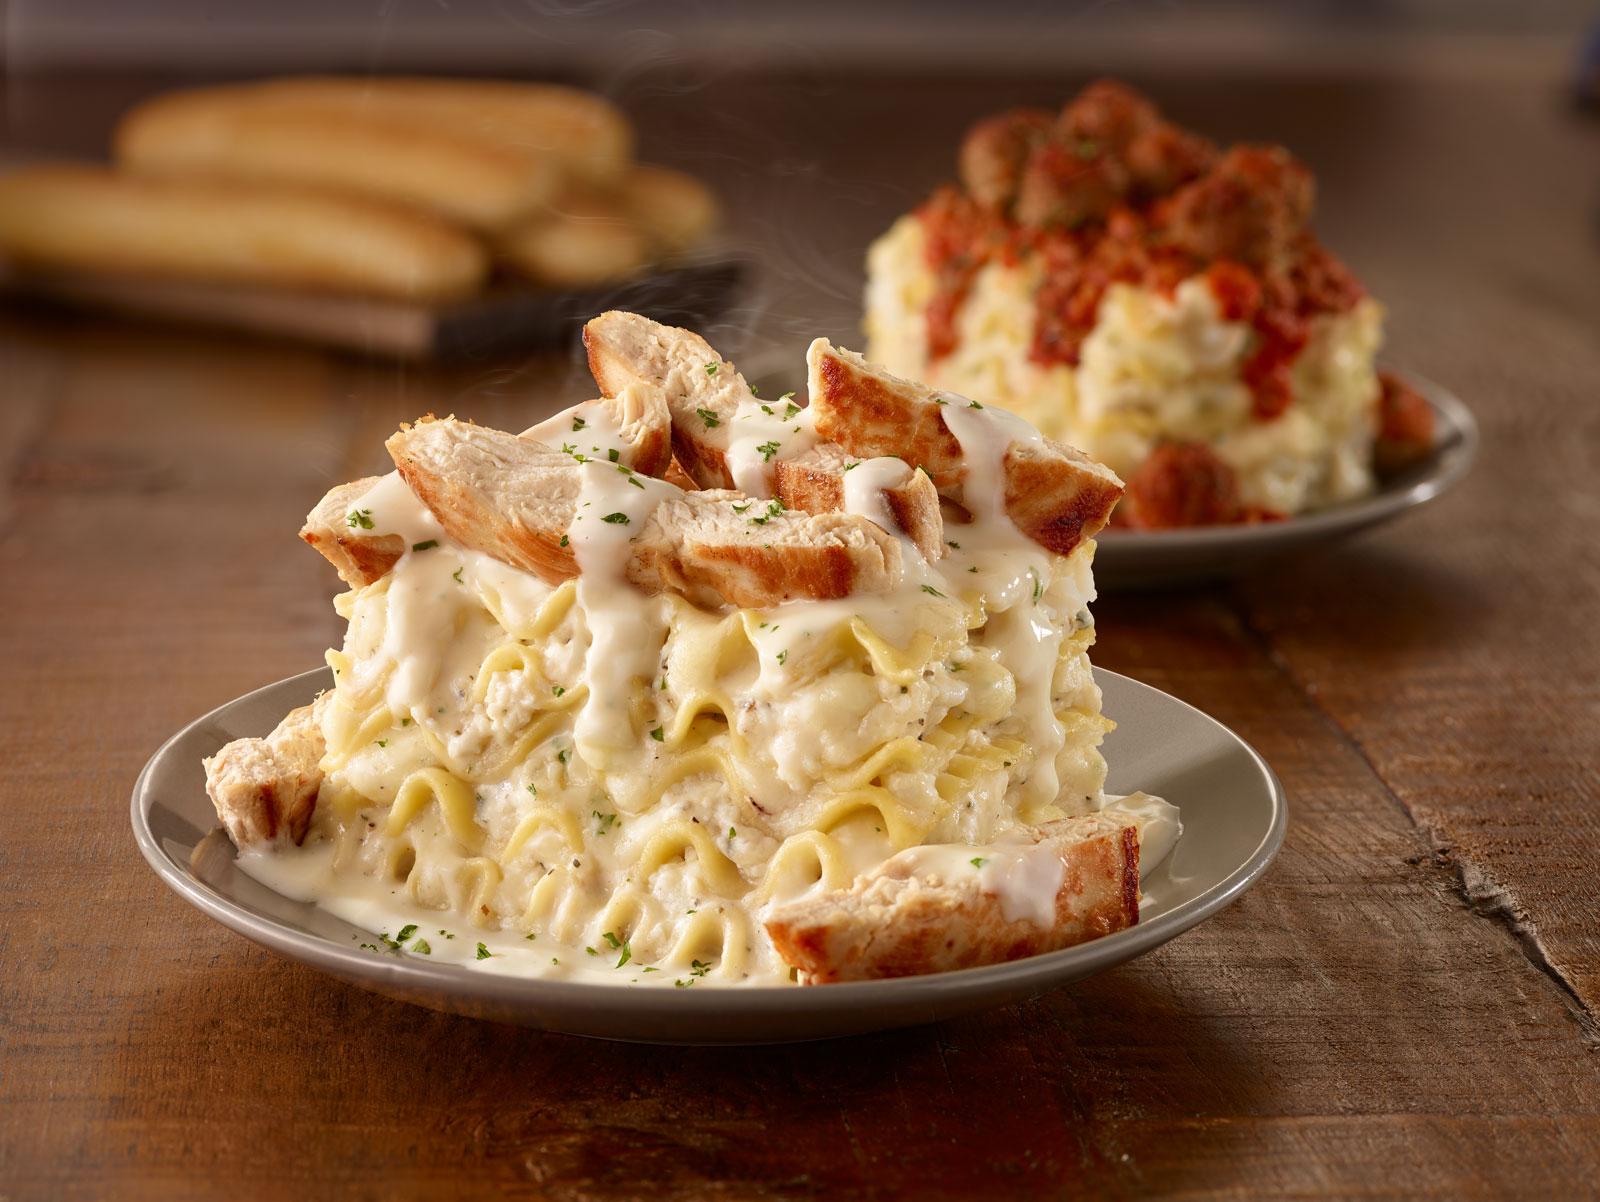 Olive Garden Introduces 'Customizable' Lasagna